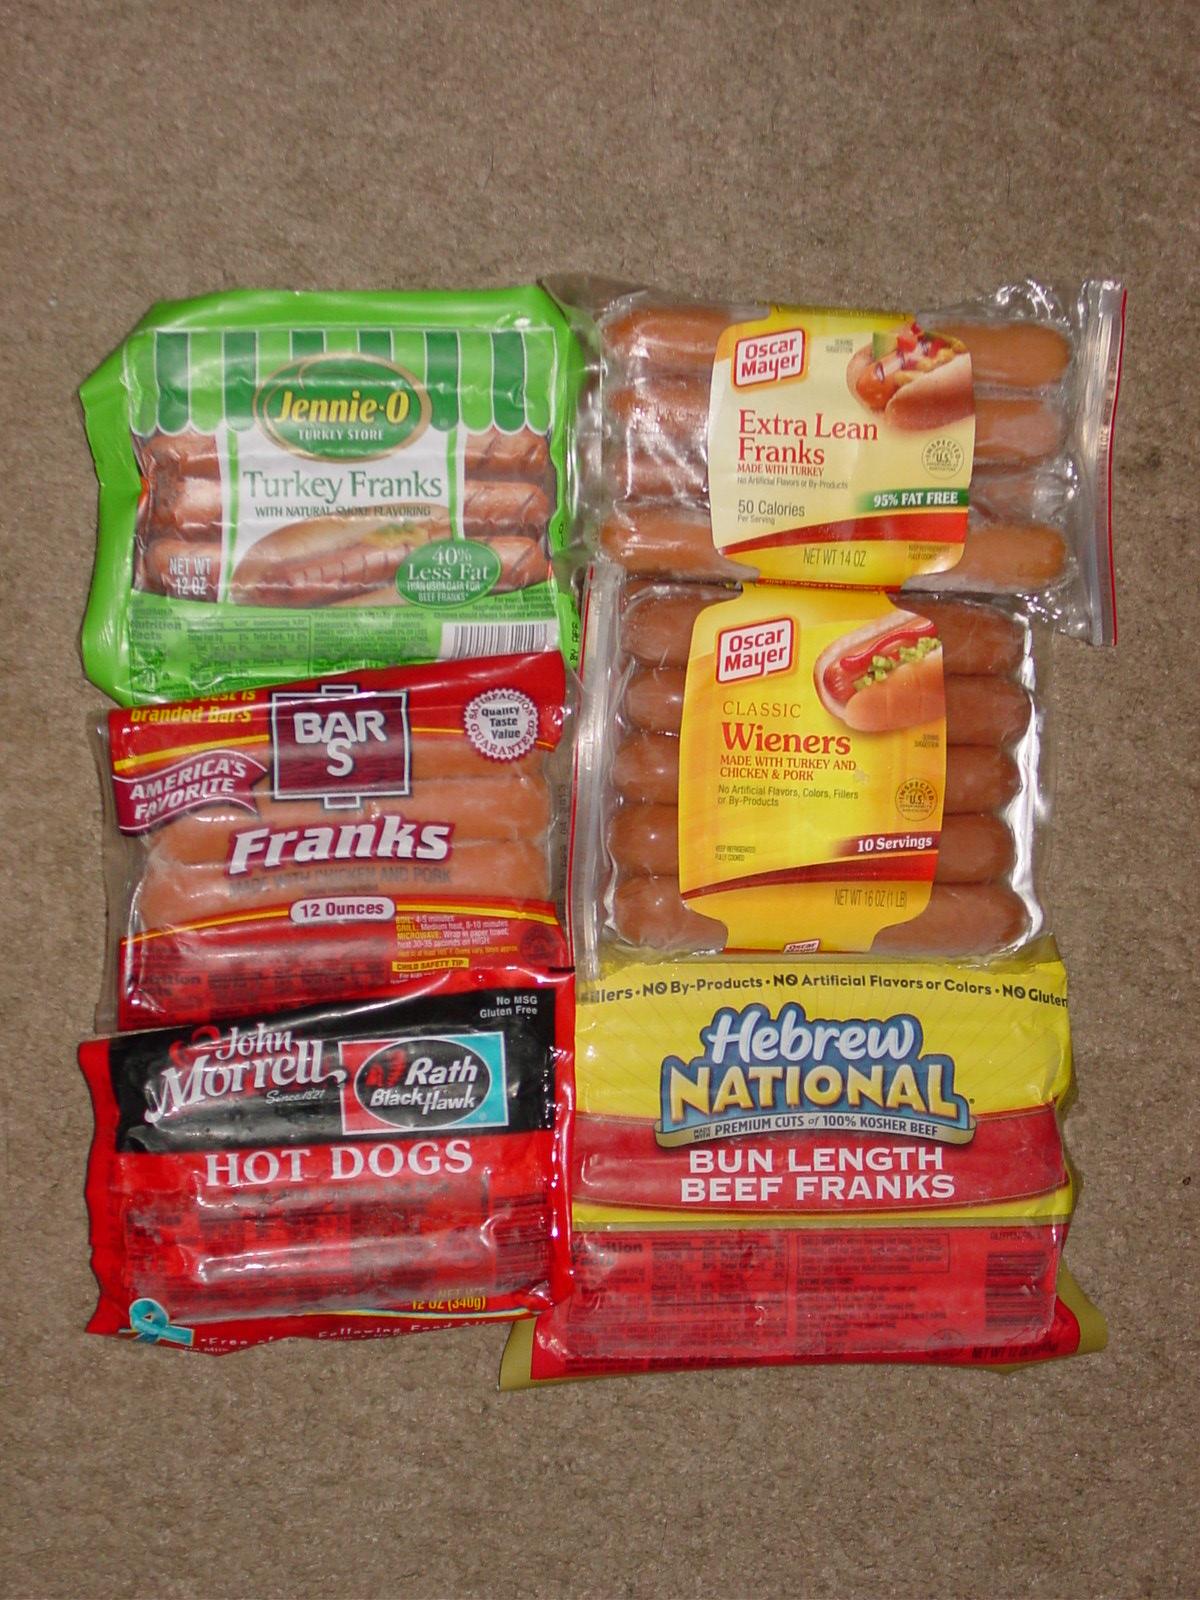 44-8496. Hotdogs.